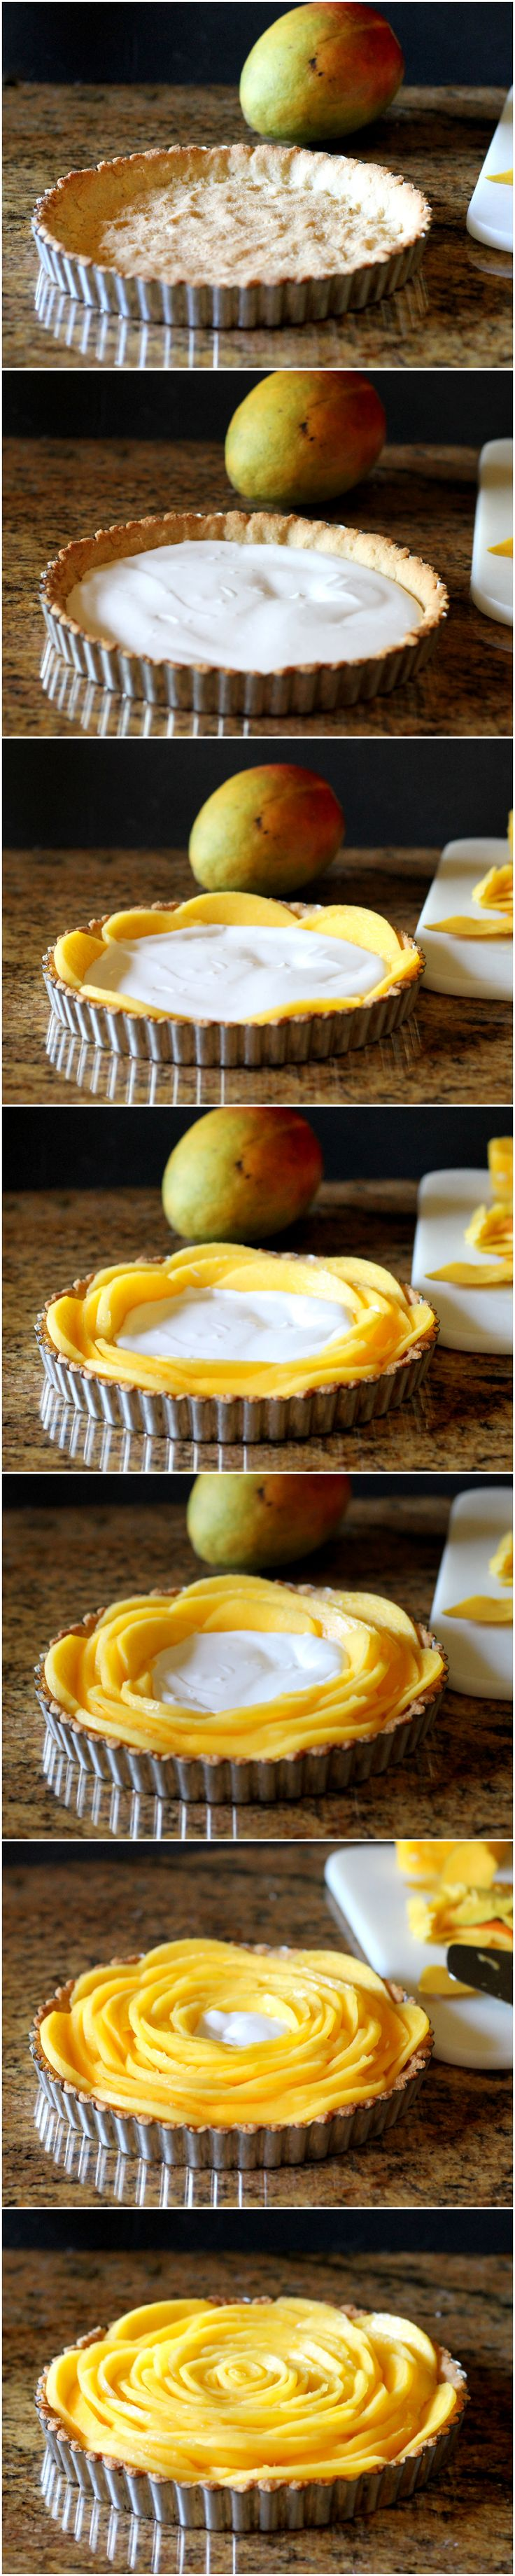 Mango Tart (GF, Paleo, Vegan, & Refined Sugar Free) | from Bakerita.com